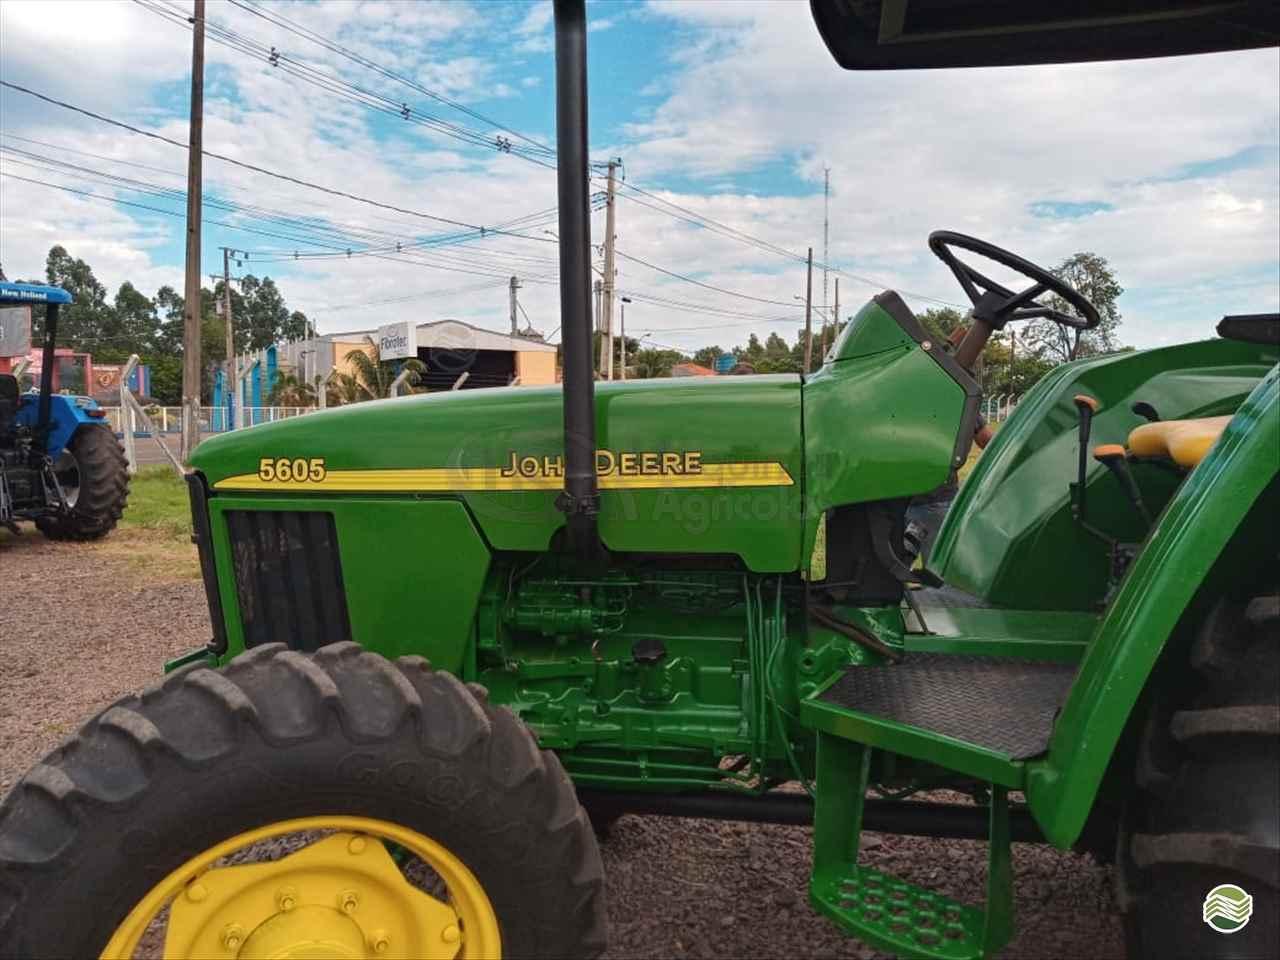 JOHN DEERE 5605 de MS Máquinas Agrícolas - DOURADOS/MS